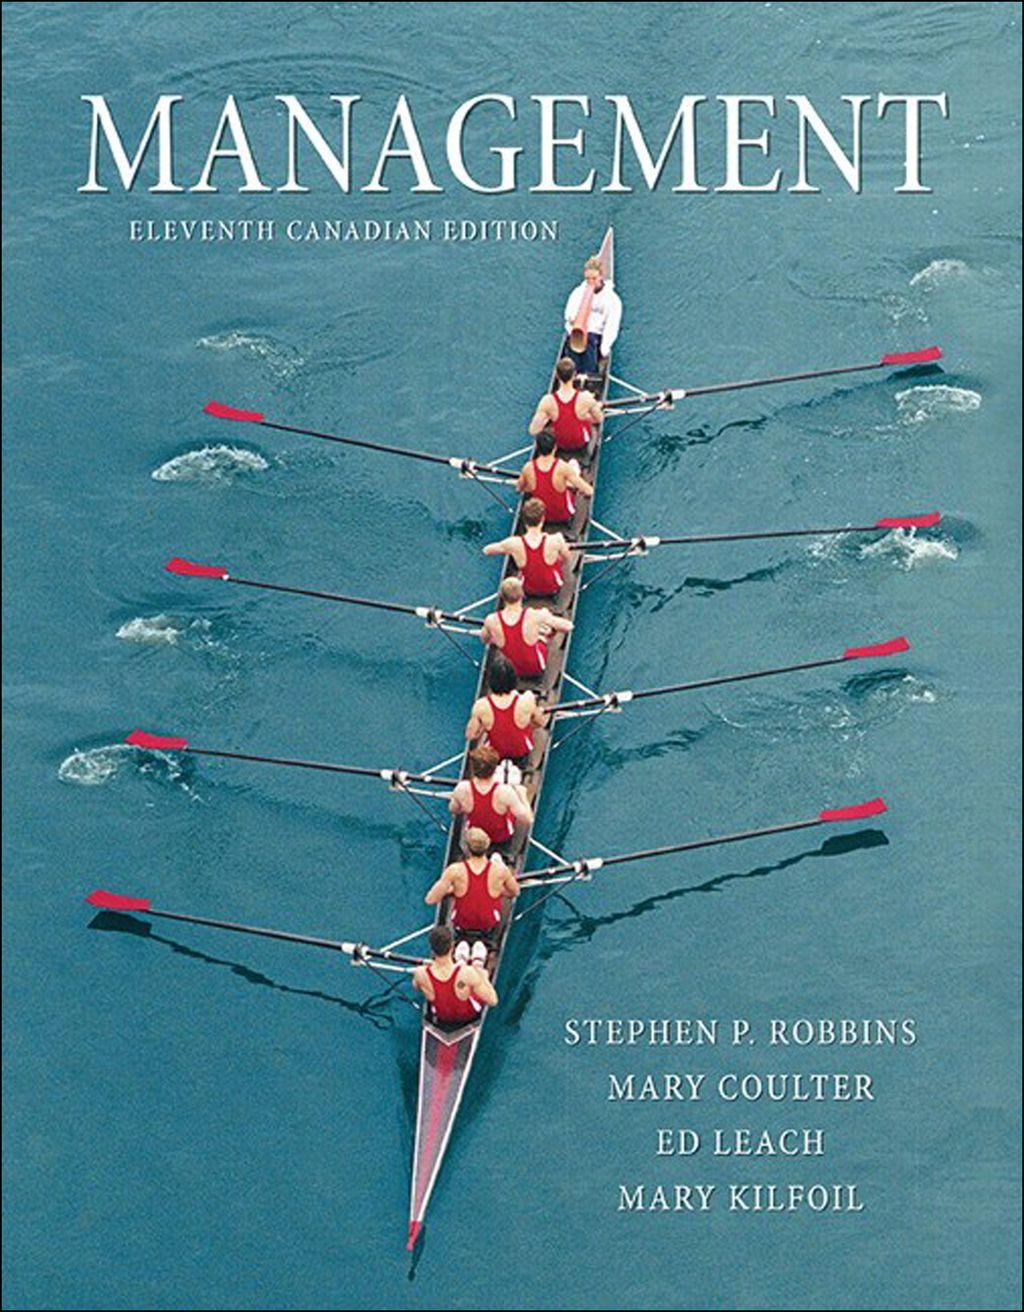 Management Eleventh Canadian Edition (eBook Rental